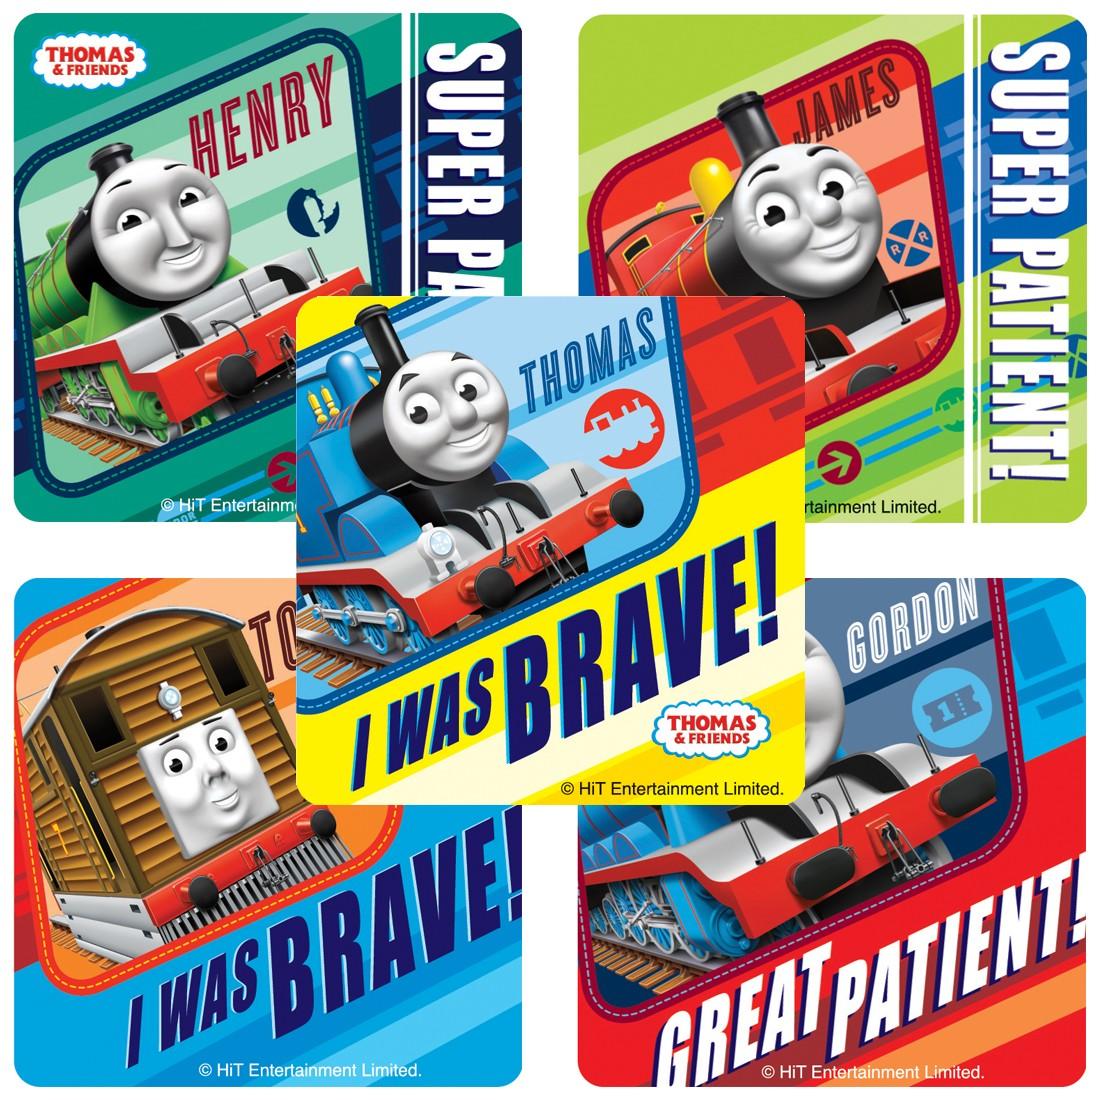 Thomas the Train & Friends Patient Stickers [image]